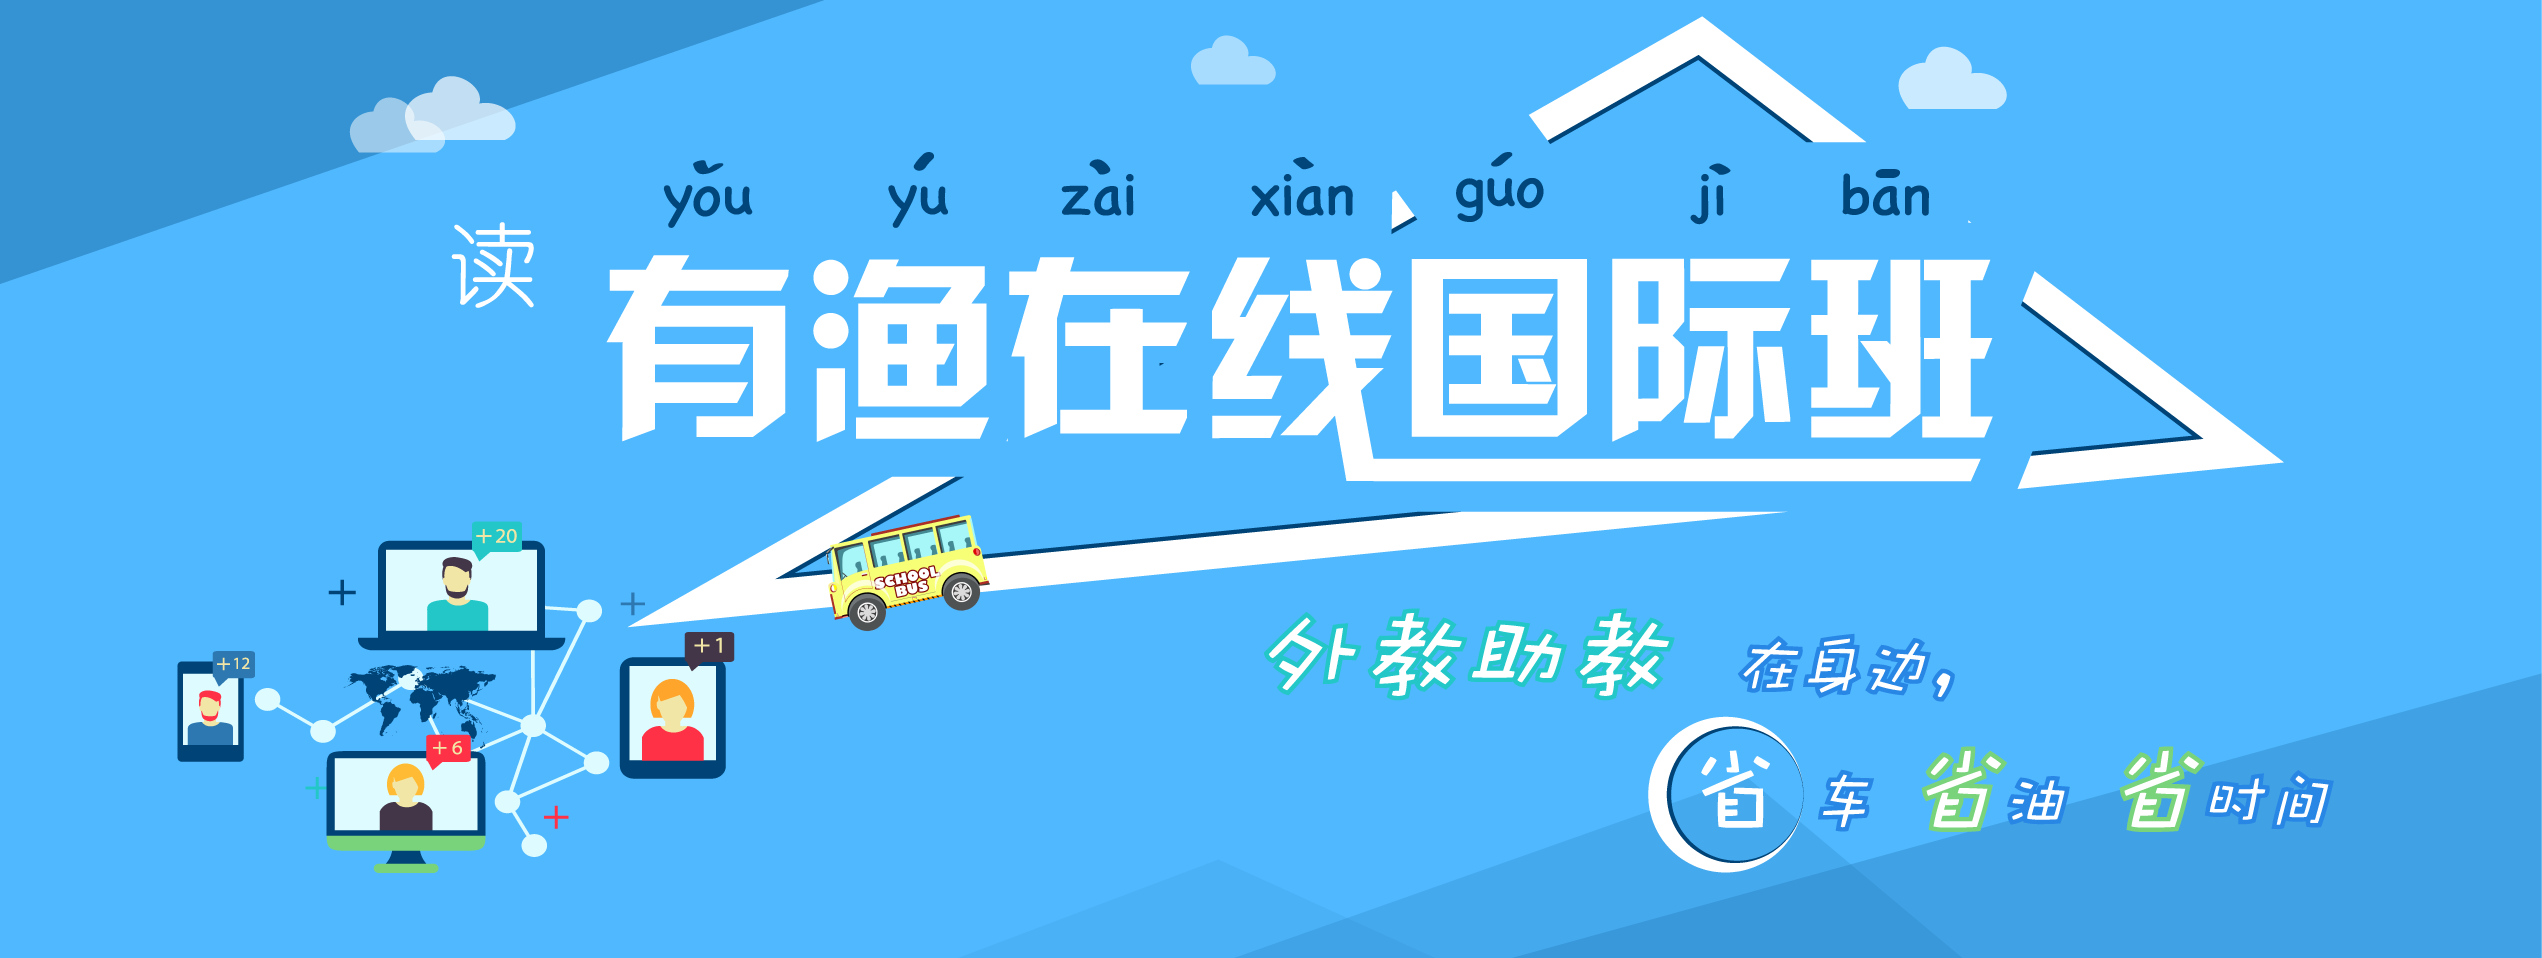 AEIM课程详情插图-01.png